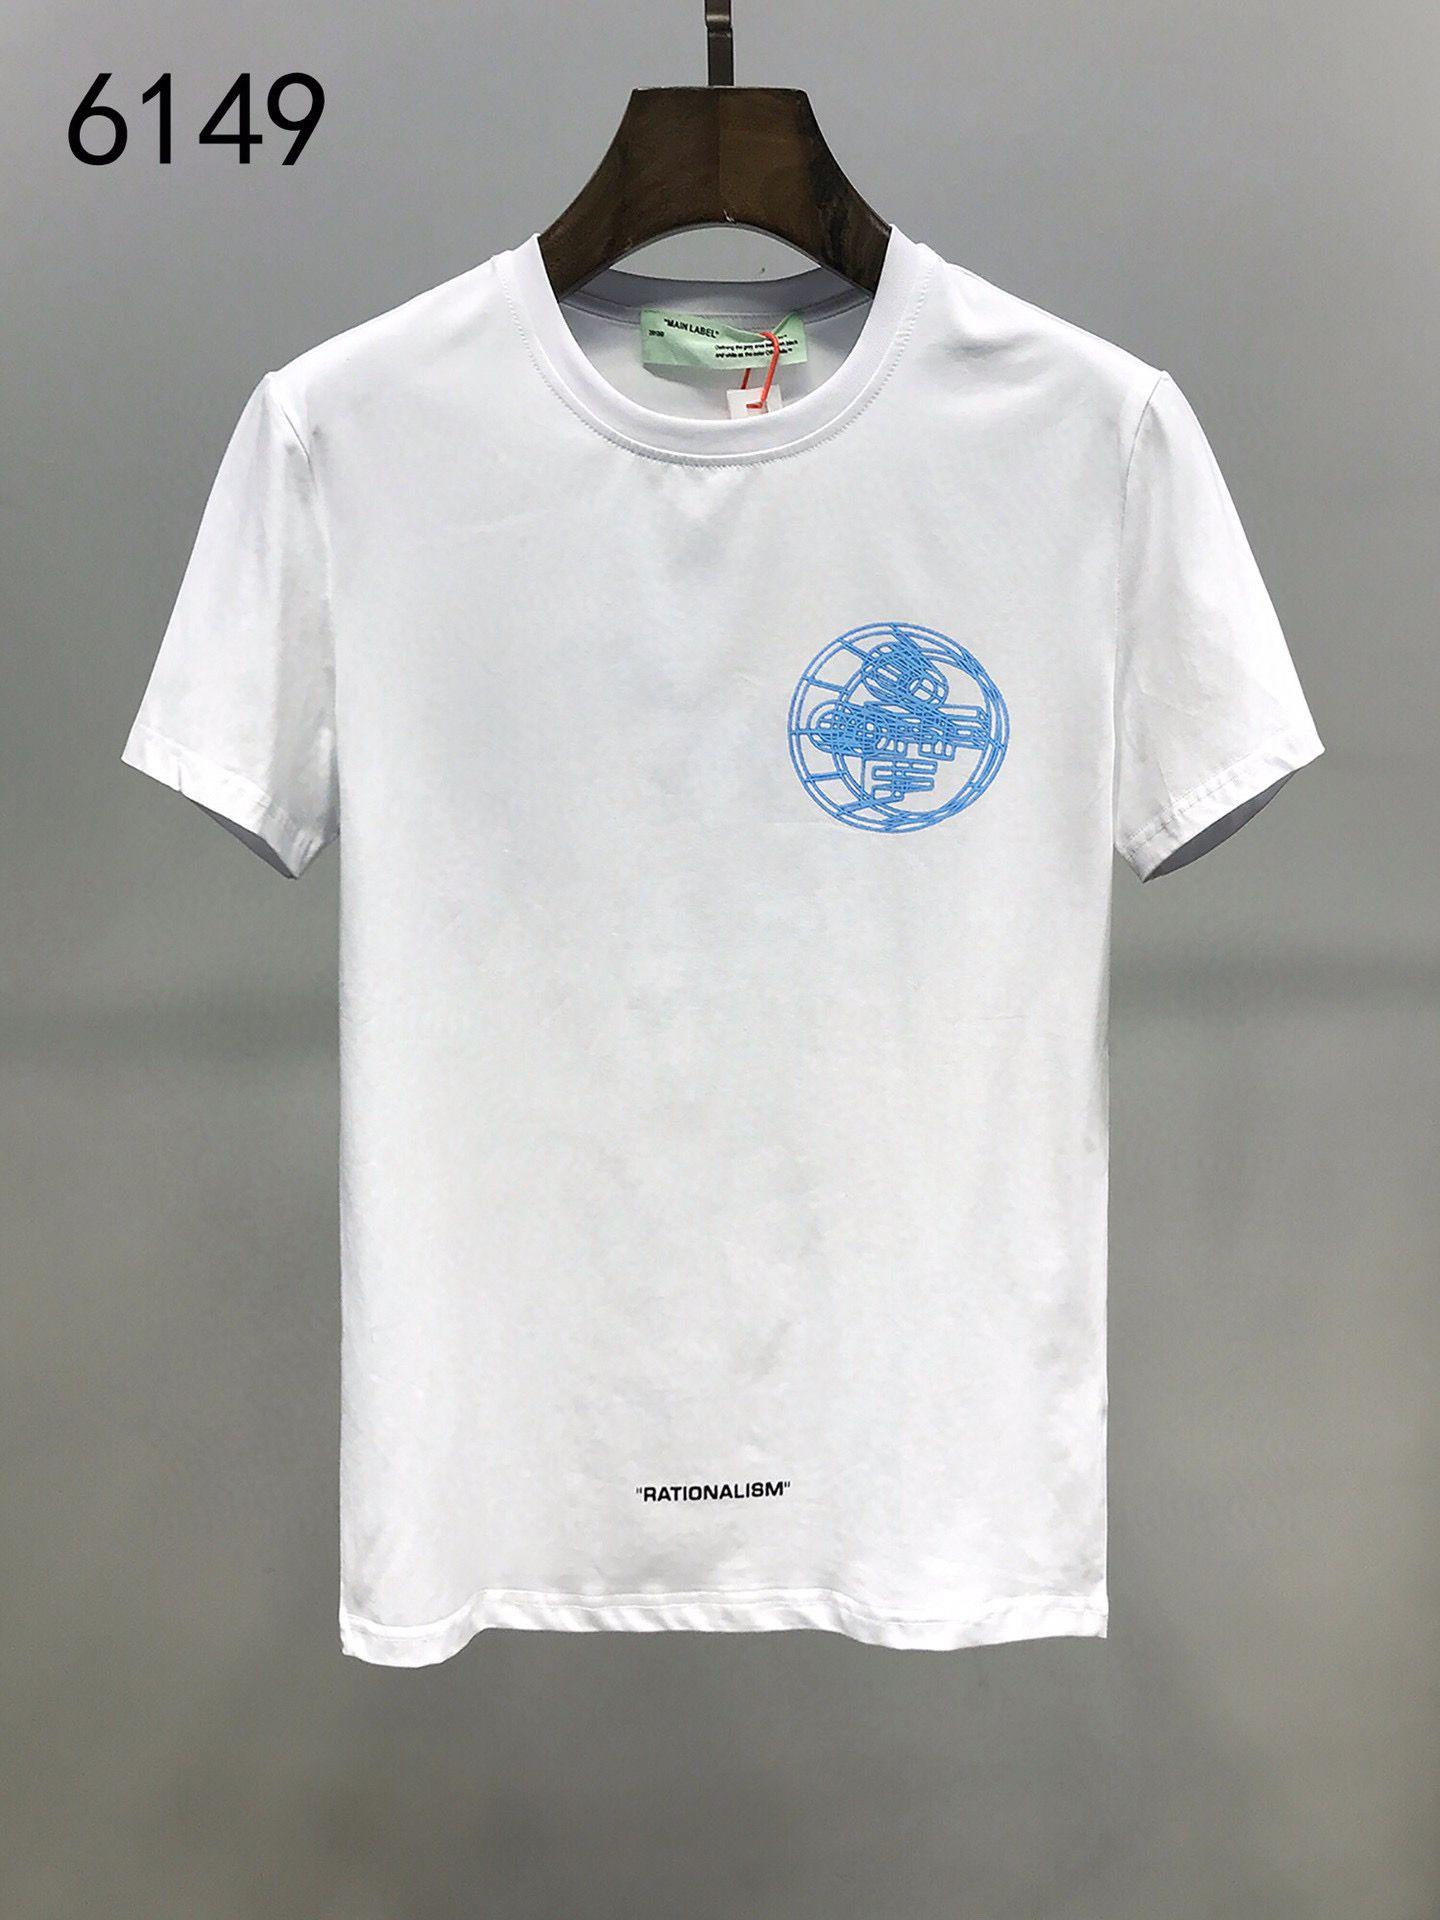 2020 yeni erkek kısa kollu temel kavisli T-shirt 02 suç marka T-shirt yıkama kumaş Yüksek Kalite Pamuk T-shirt M-3XL boyutu #P1